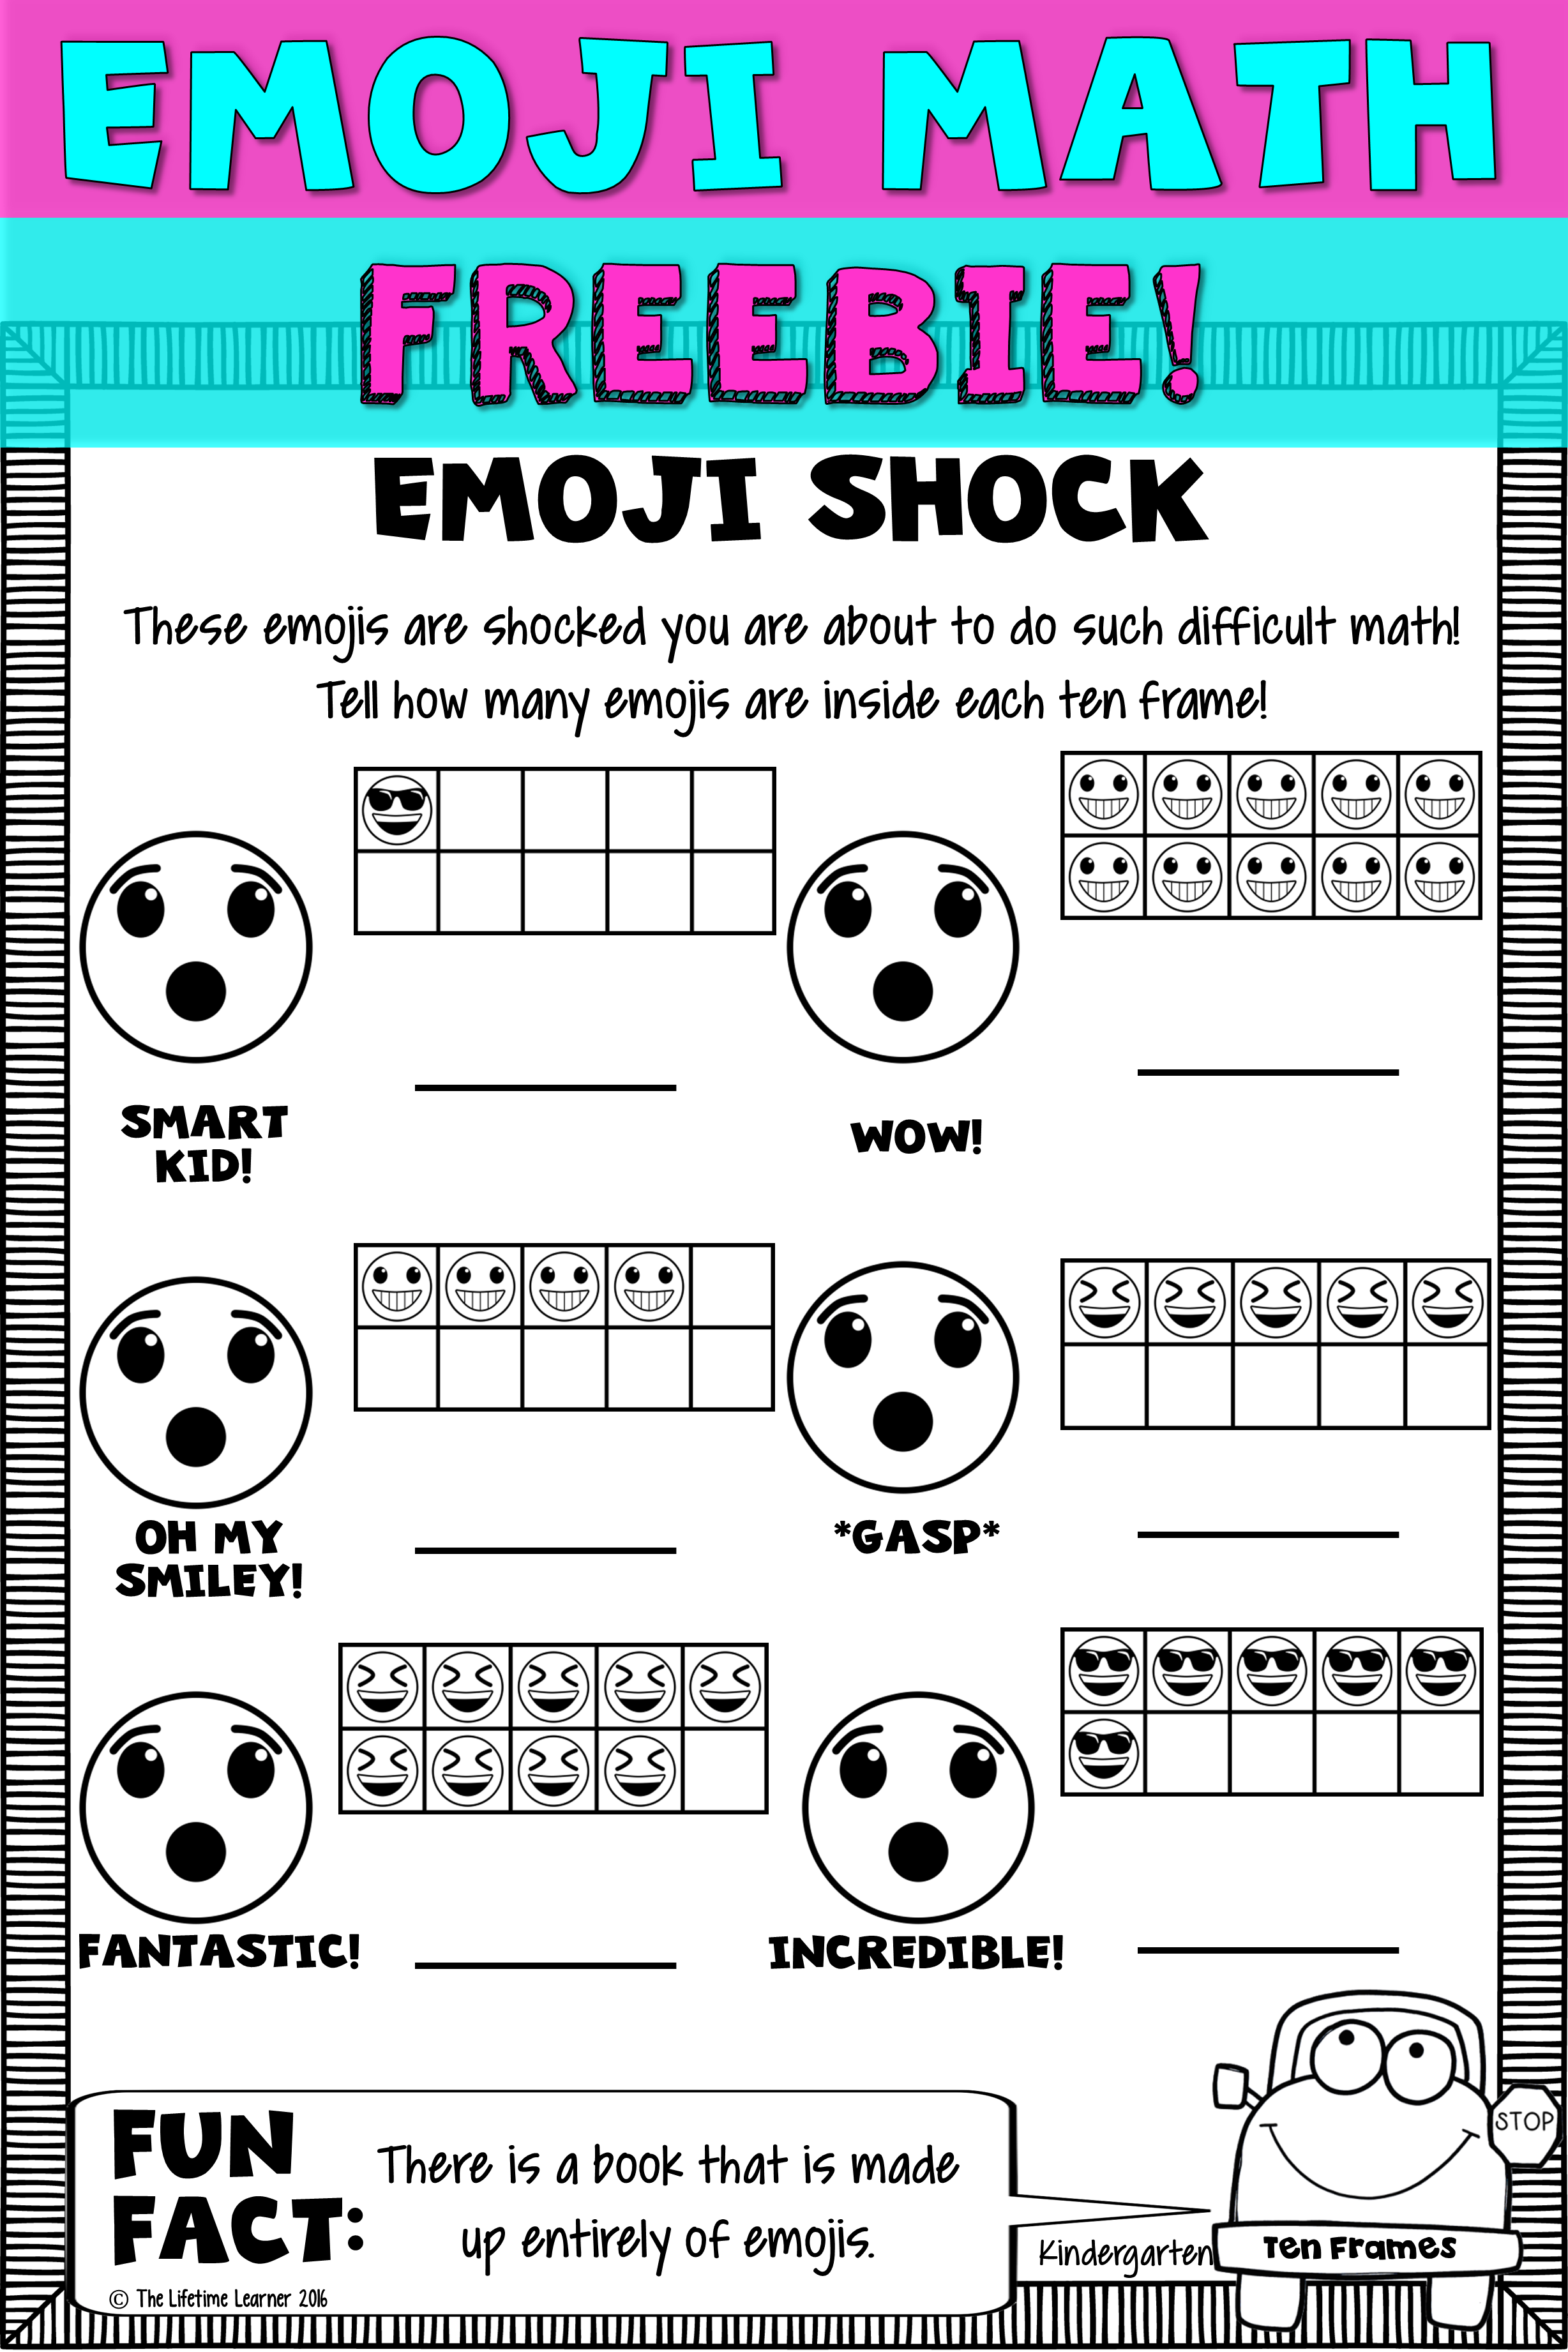 Kindergarten math is more fun with emojis! This freebie has 1 free ...